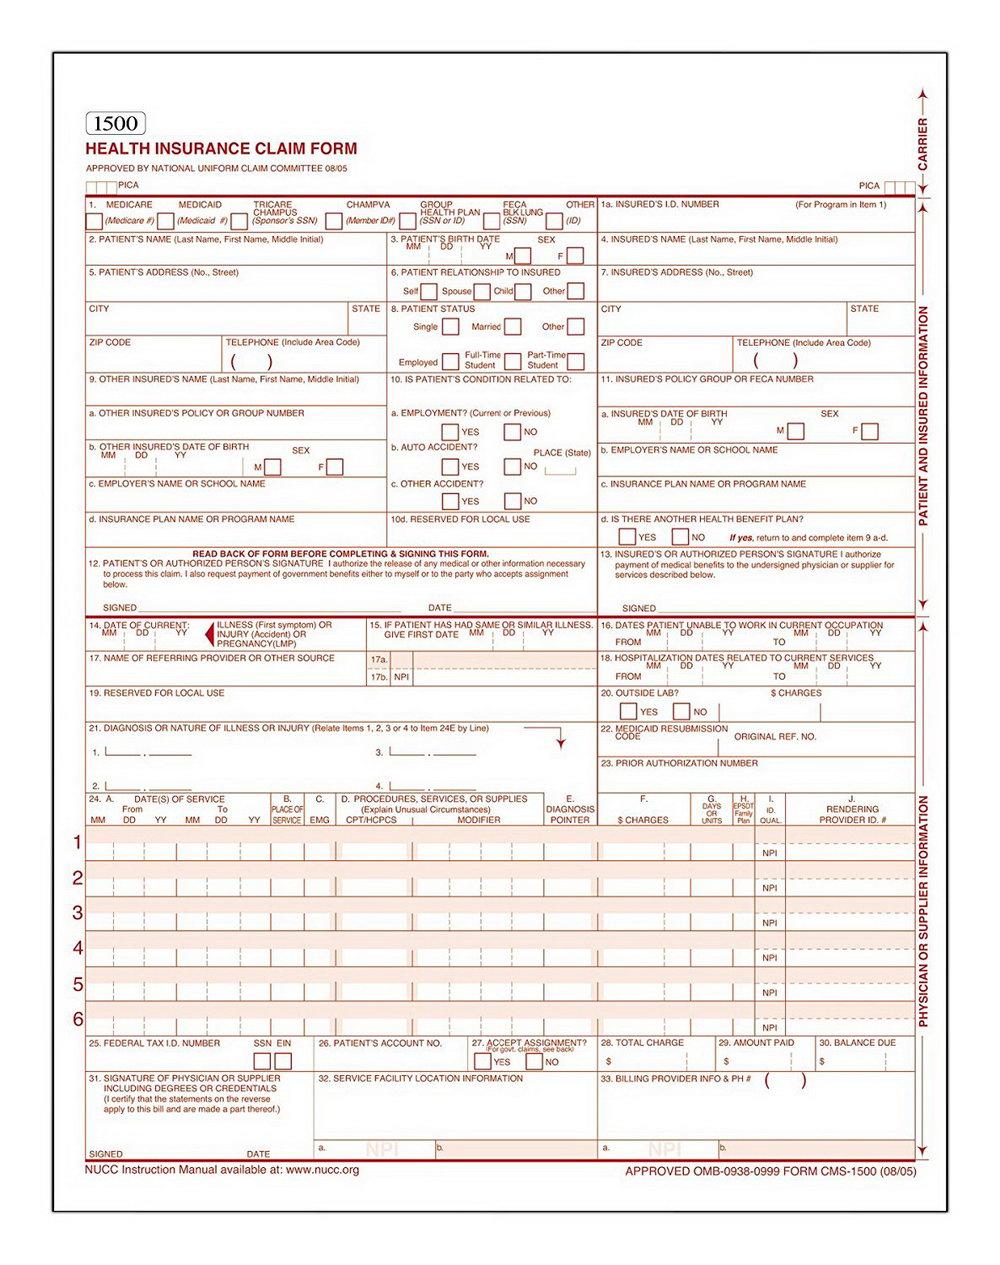 Hcfa 1500 Claim Form